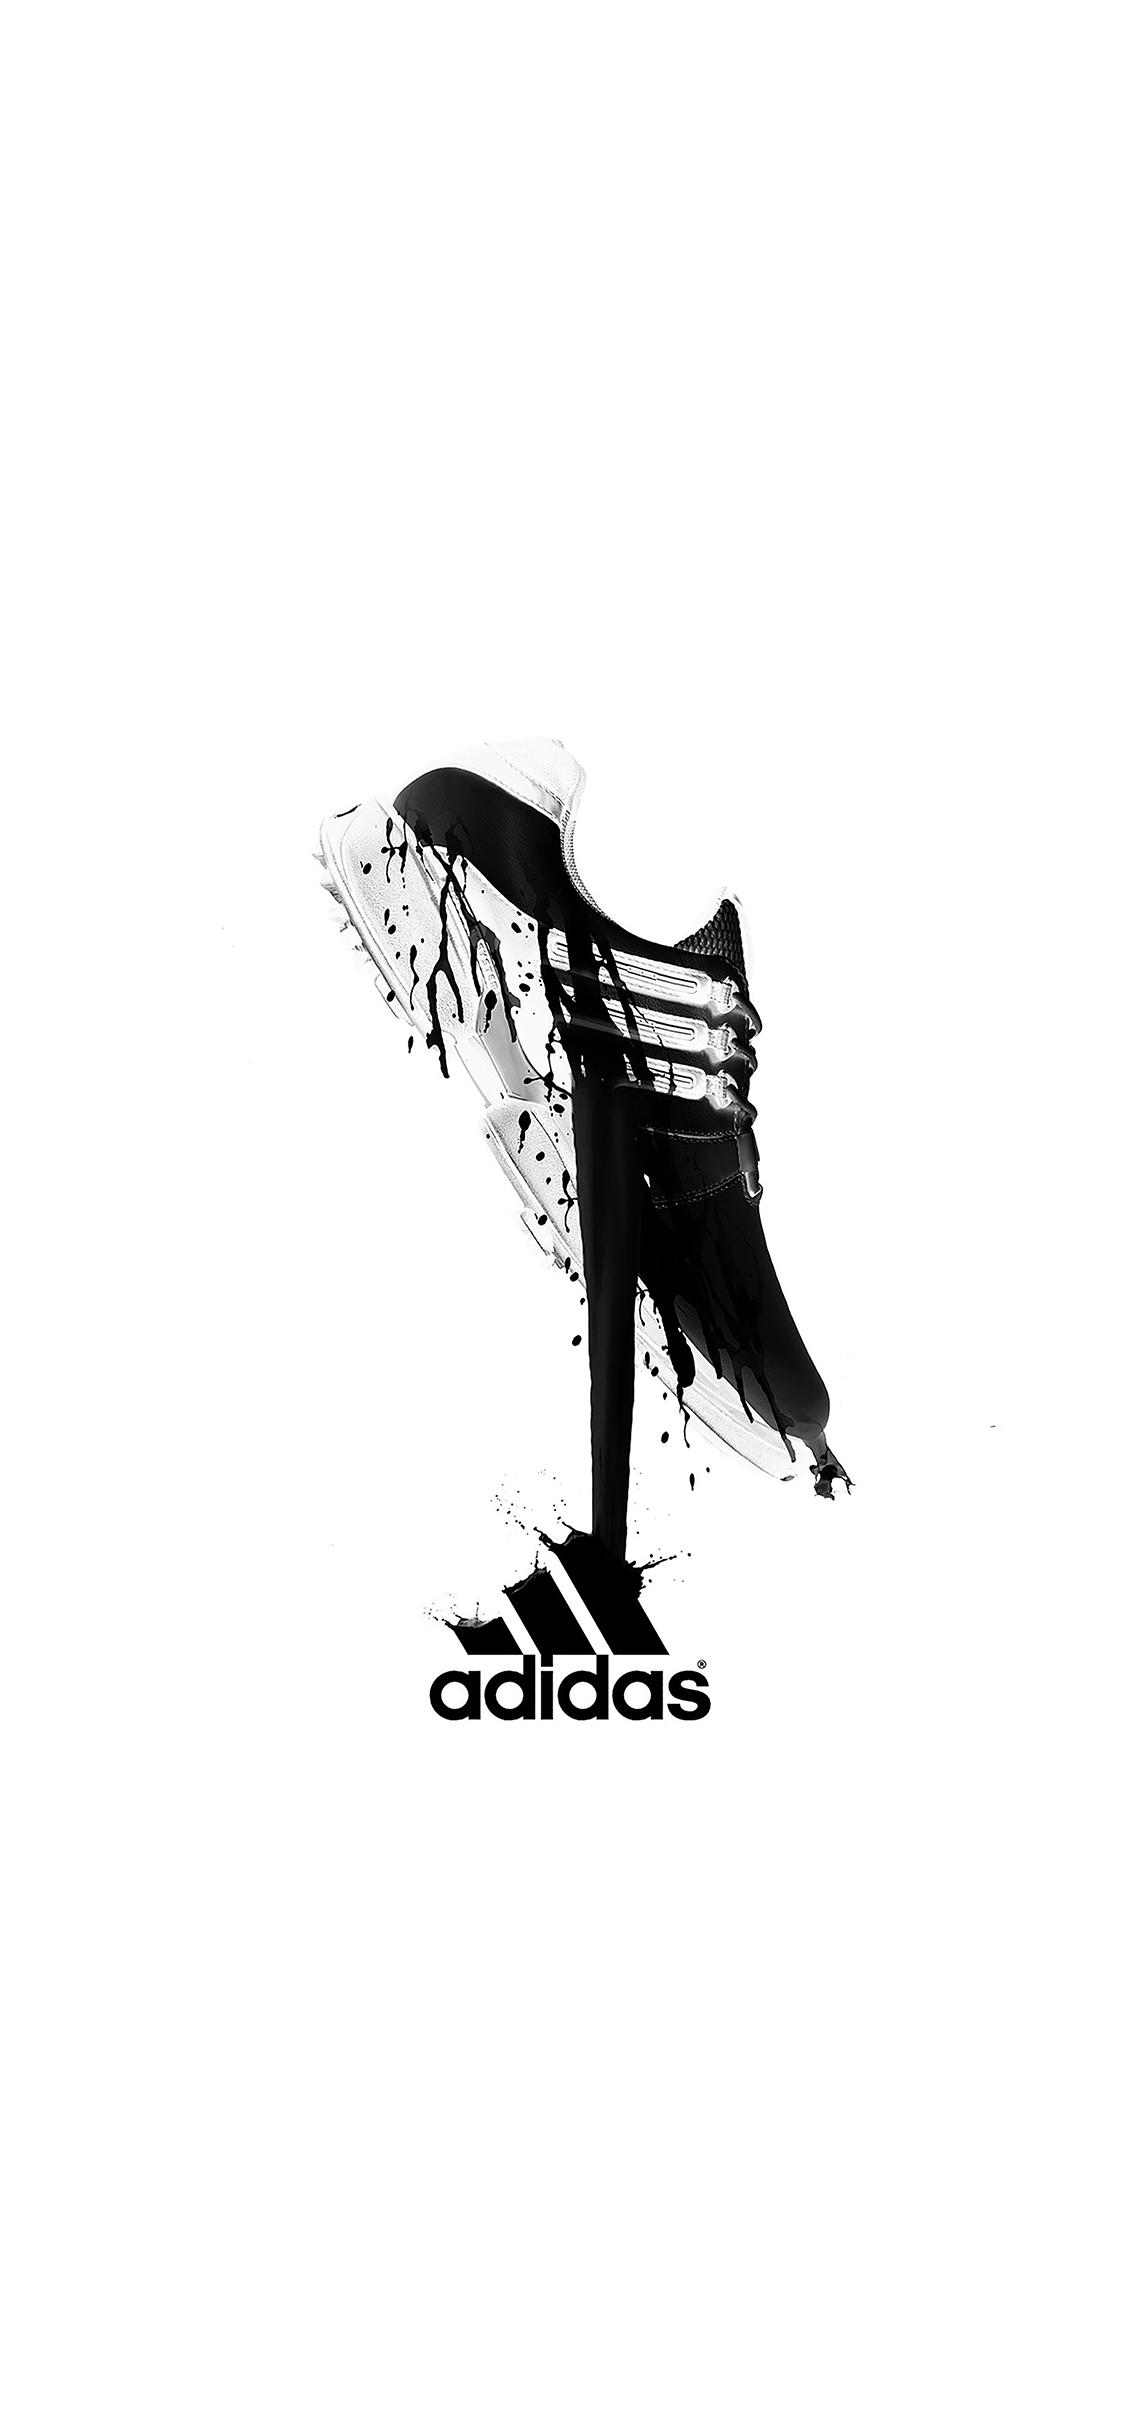 iPhoneXpapers.com-Apple-iPhone-wallpaper-ad58-adidas-black-logo